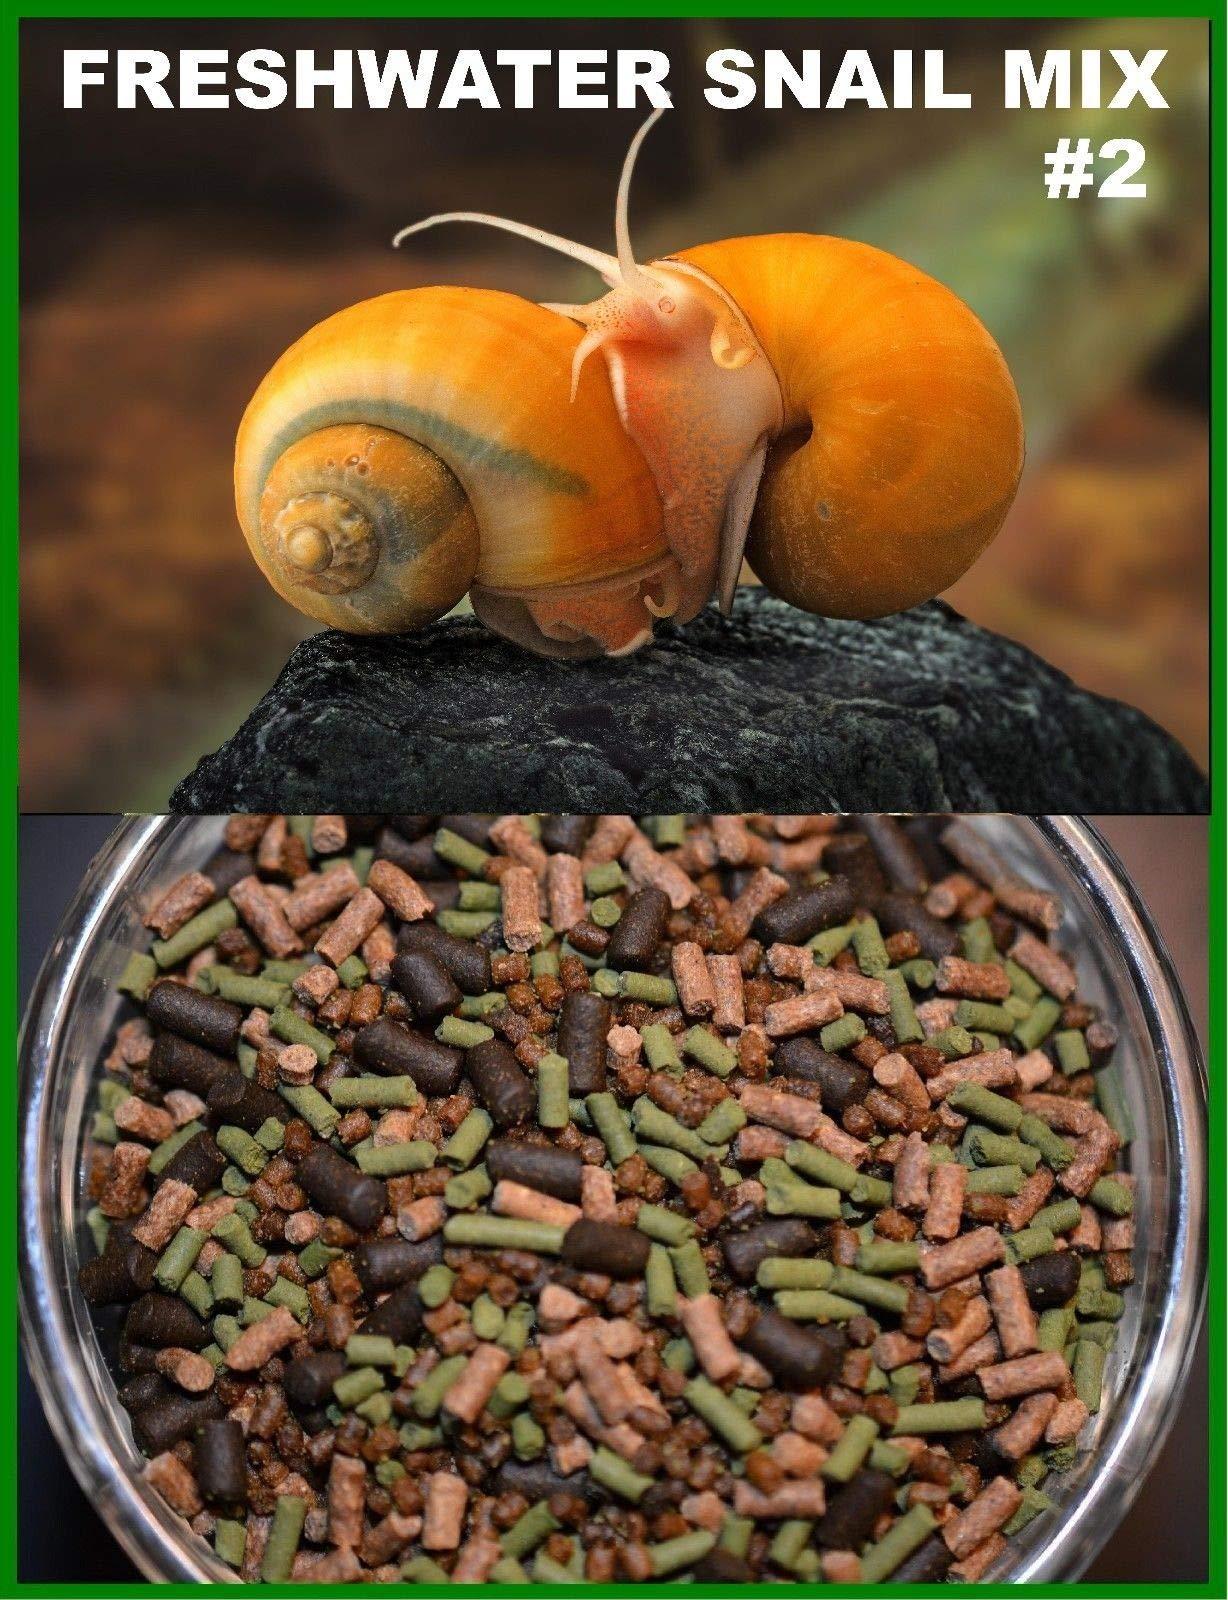 AQUATICBLENDEDFOODS Super Freshwater Snail Mix #2 - Snail,Shrimp,Fish & Crayfish Food (16oz - 1 LB.)- ABF2 by AQUATICBLENDEDFOODS